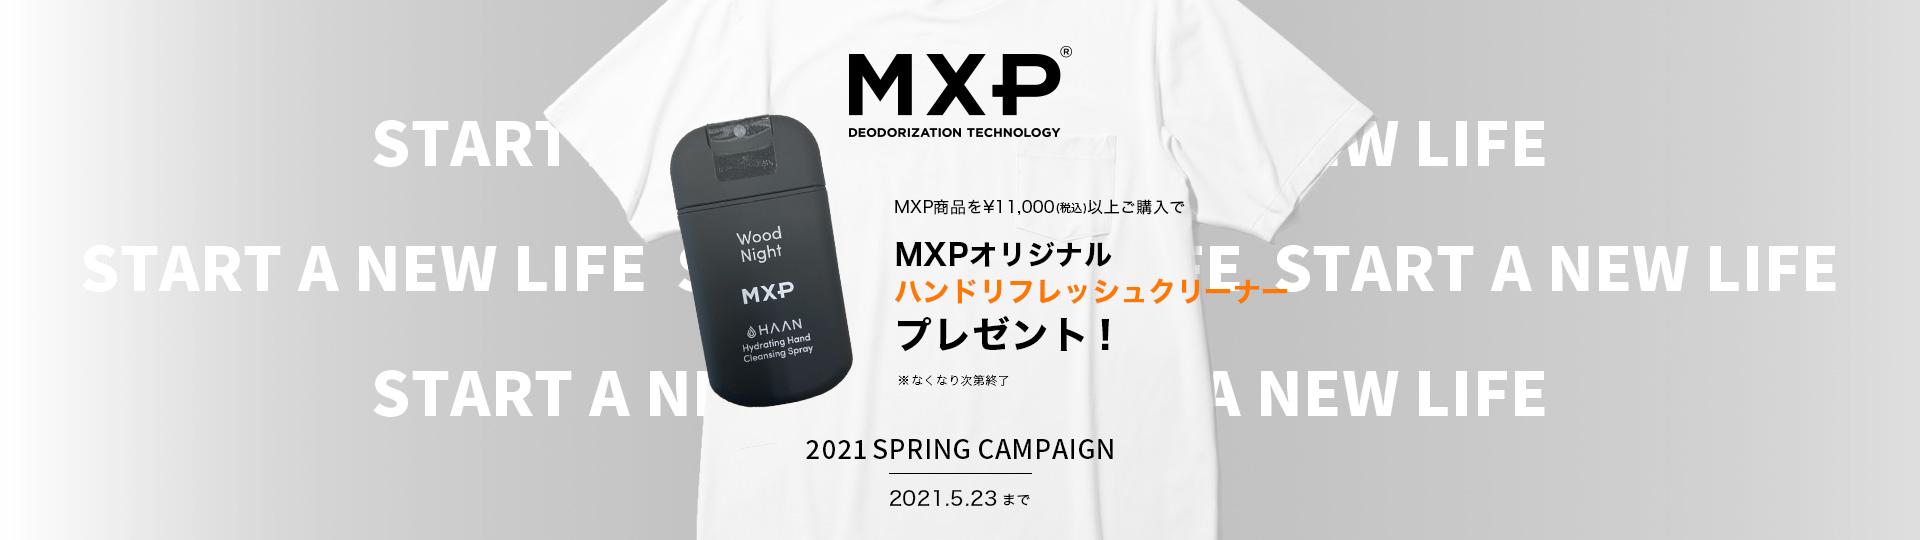 MXP 2021 SPRING CAMPAIGN